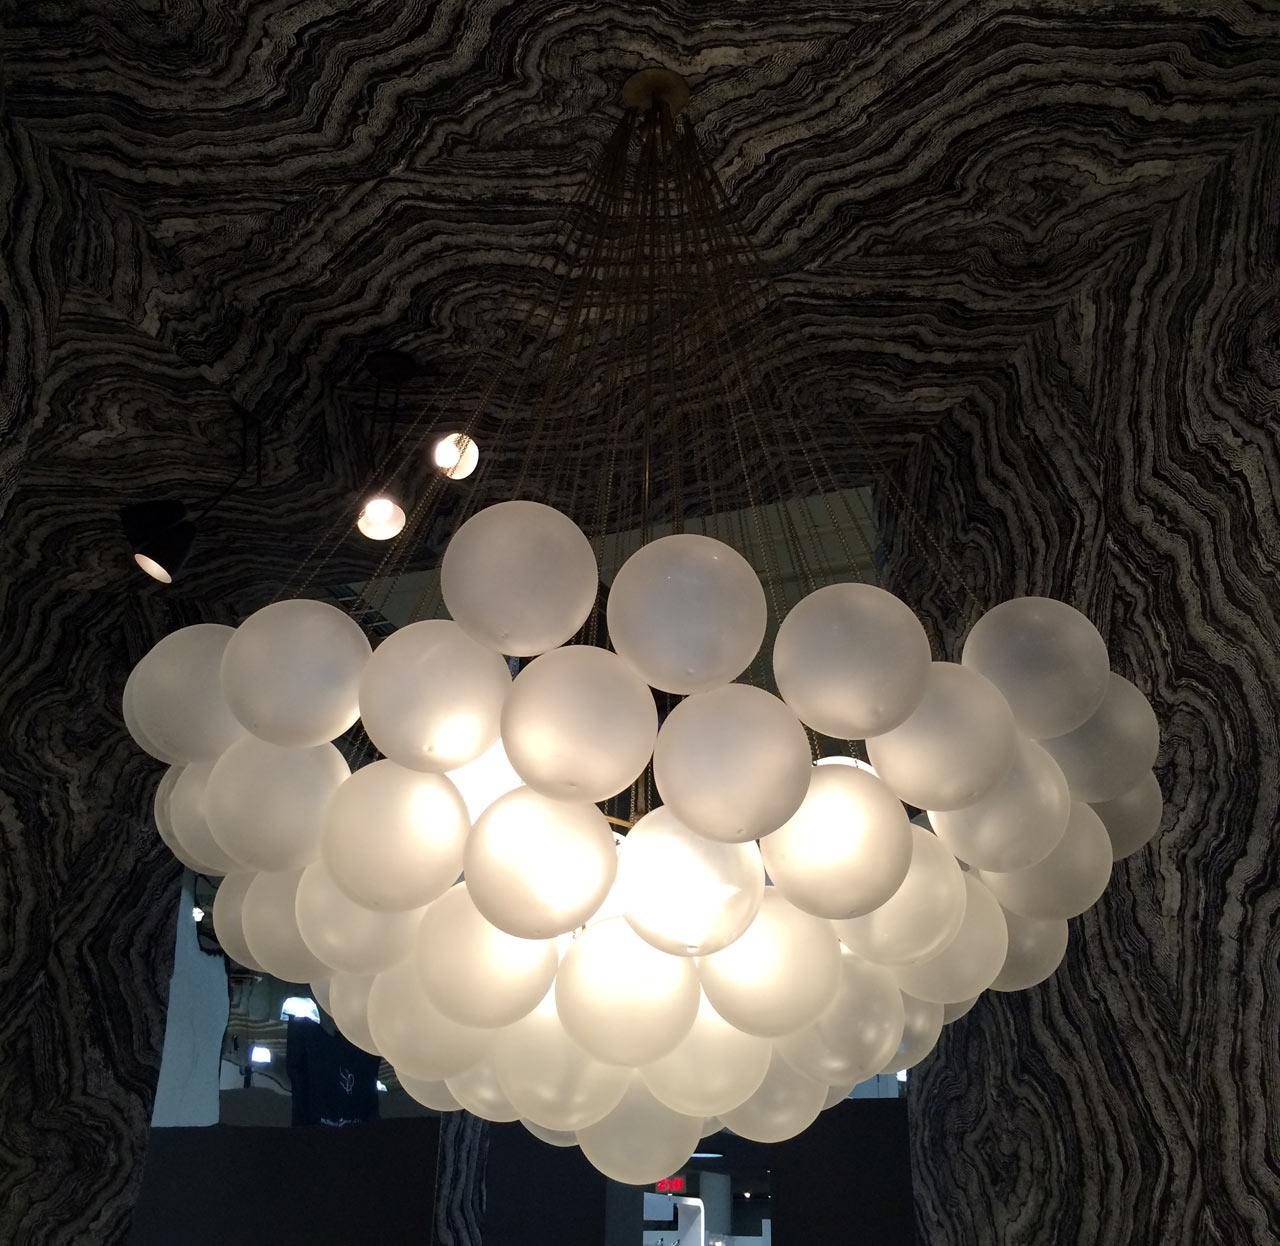 ICFF2-2-apparatus-cloud-chandelier-best-show